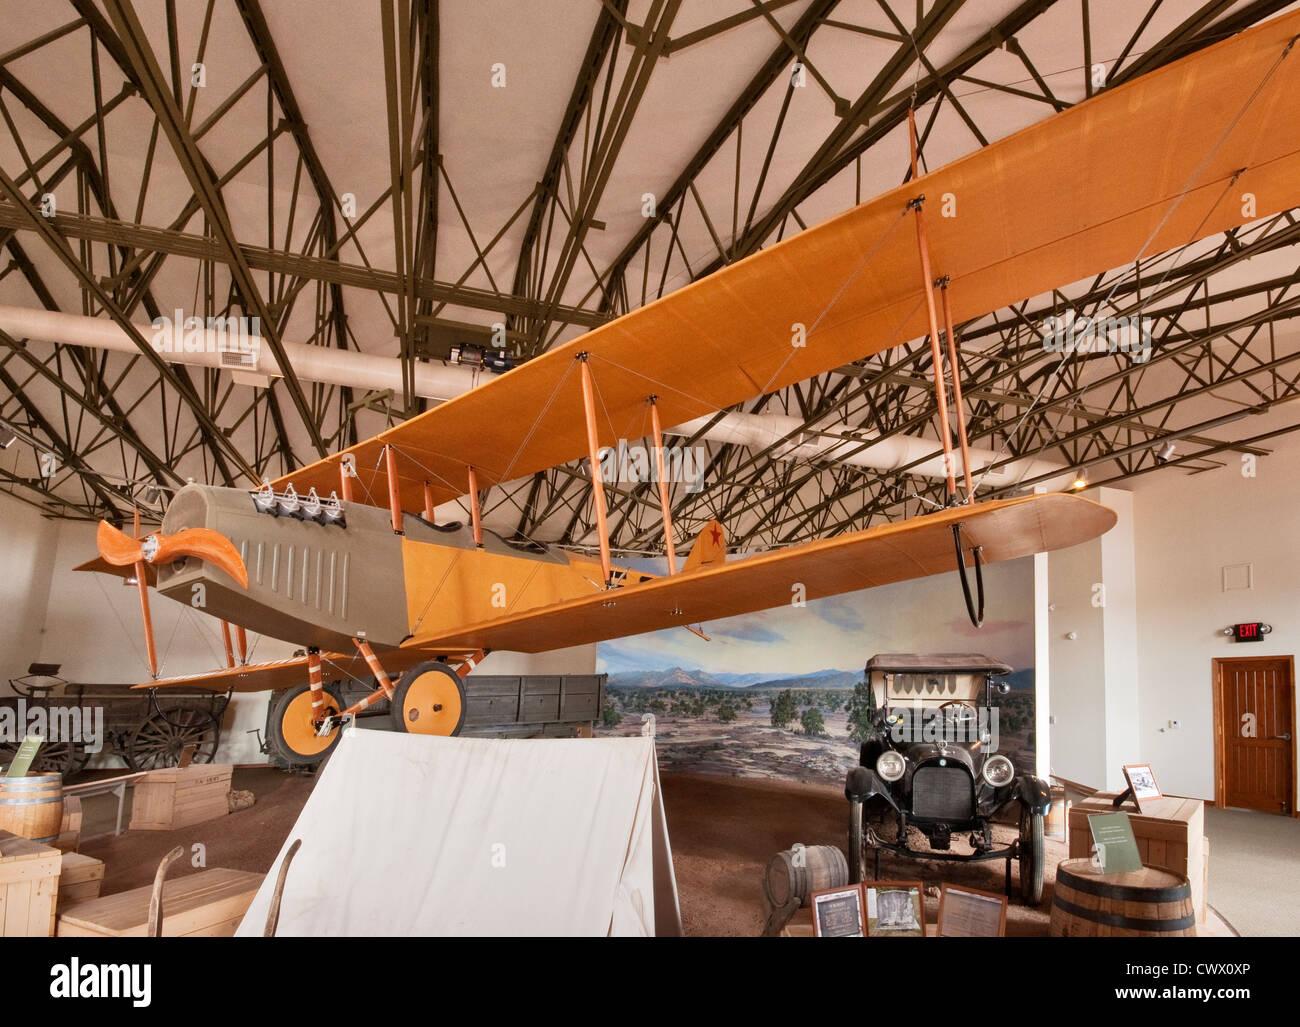 1916 Curtiss JN-3 Jenny biplane, at Exhibit Hall at Pancho Villa State Park in Columbus, New Mexico, USA - Stock Image